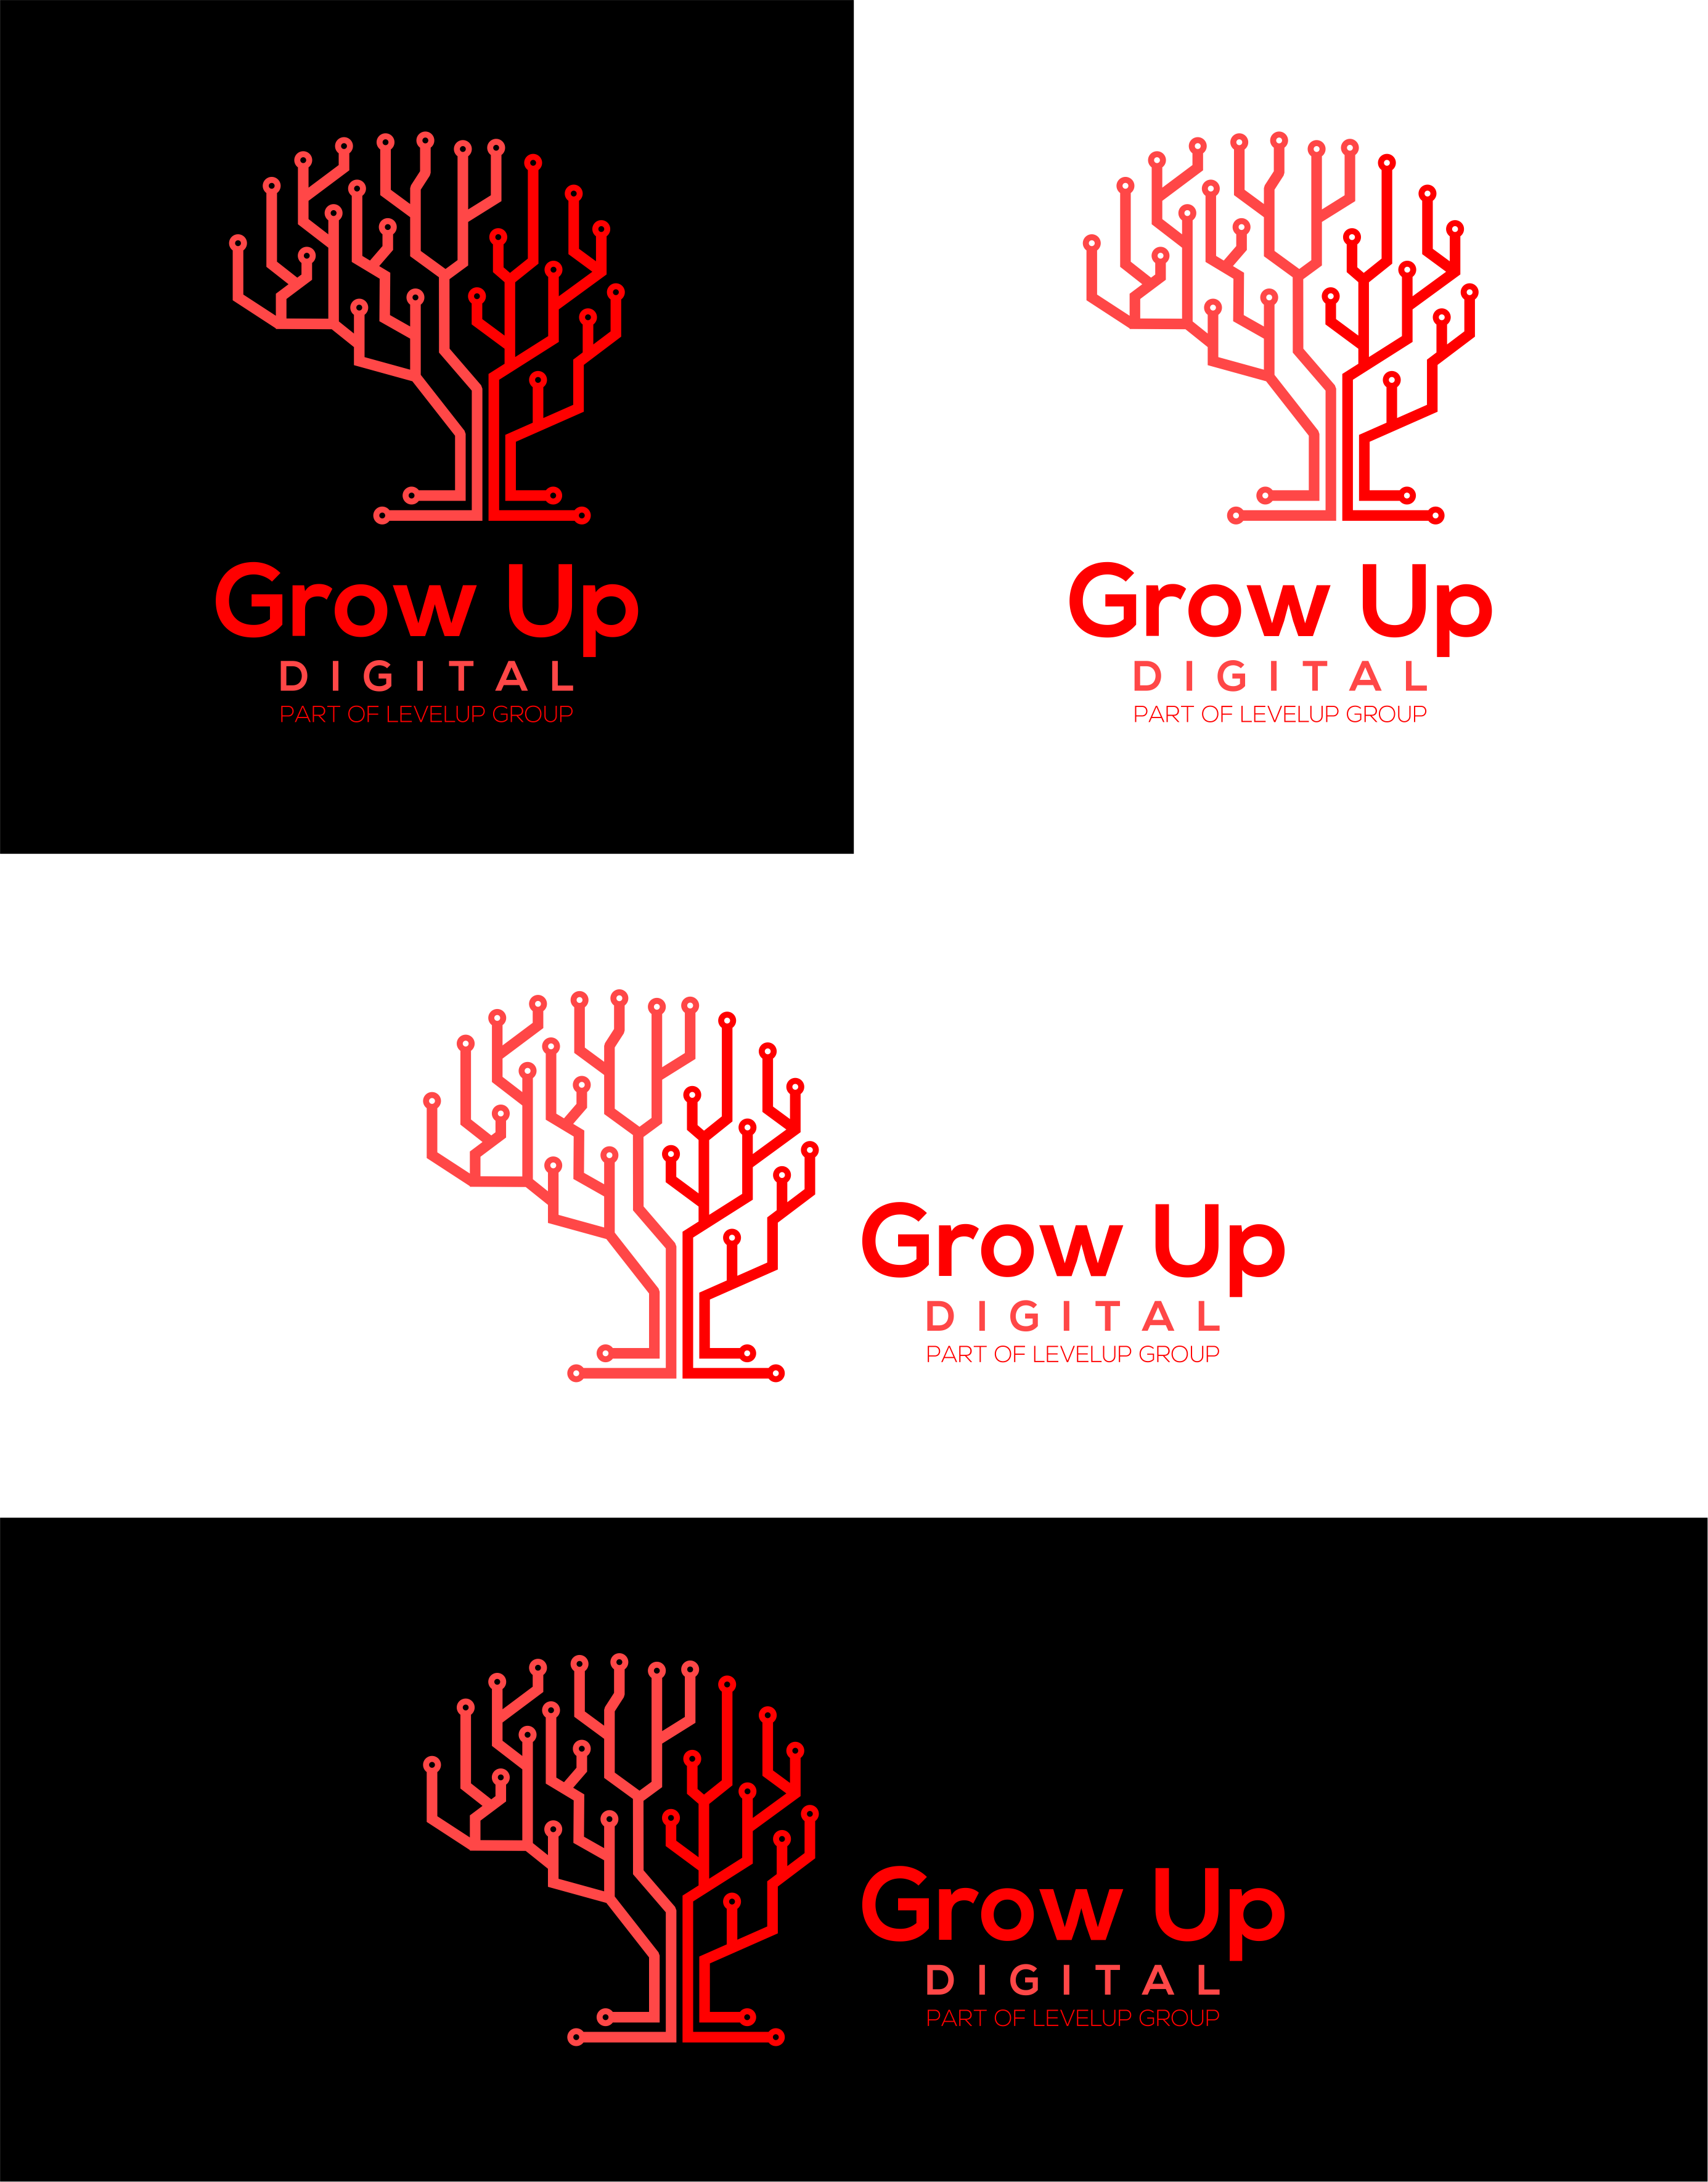 Design logo for digital marketing start up Grow Up Digital